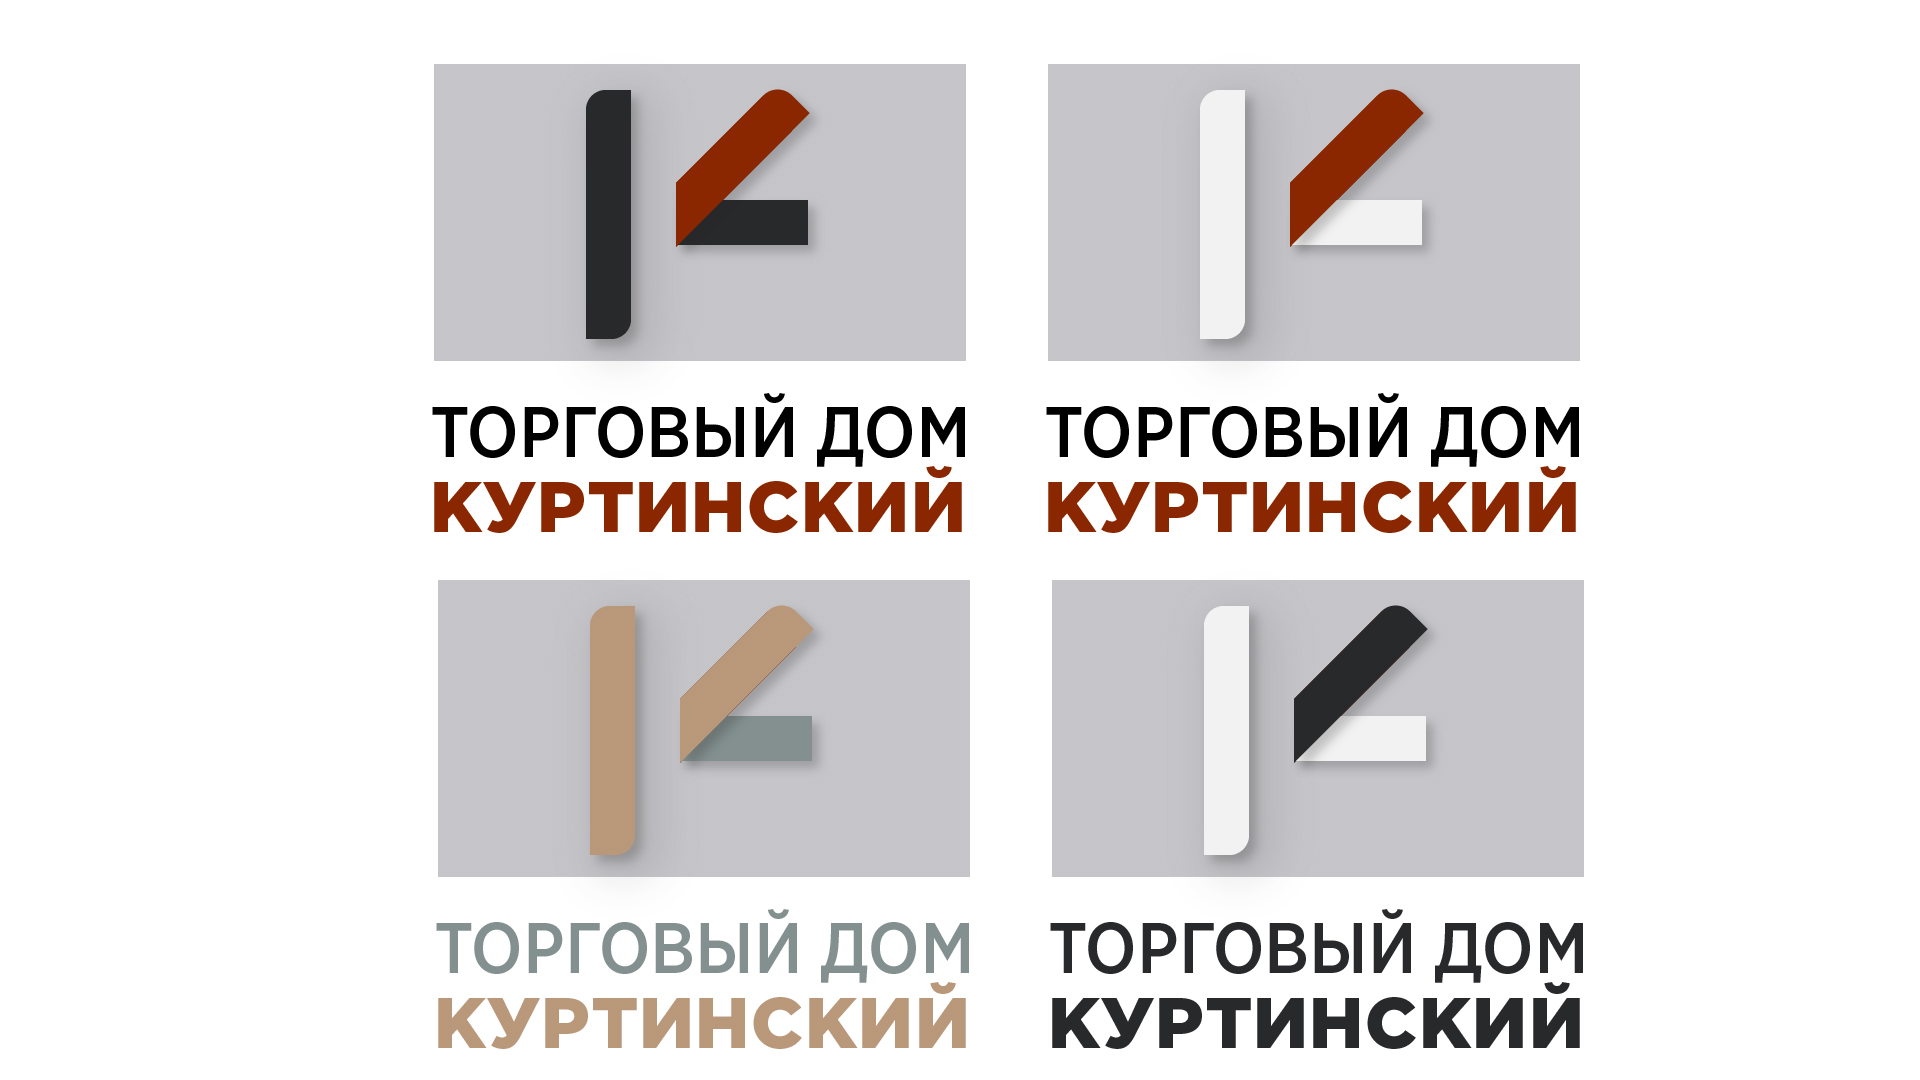 Логотип для камнедобывающей компании фото f_5845b992a74ab5c4.jpg